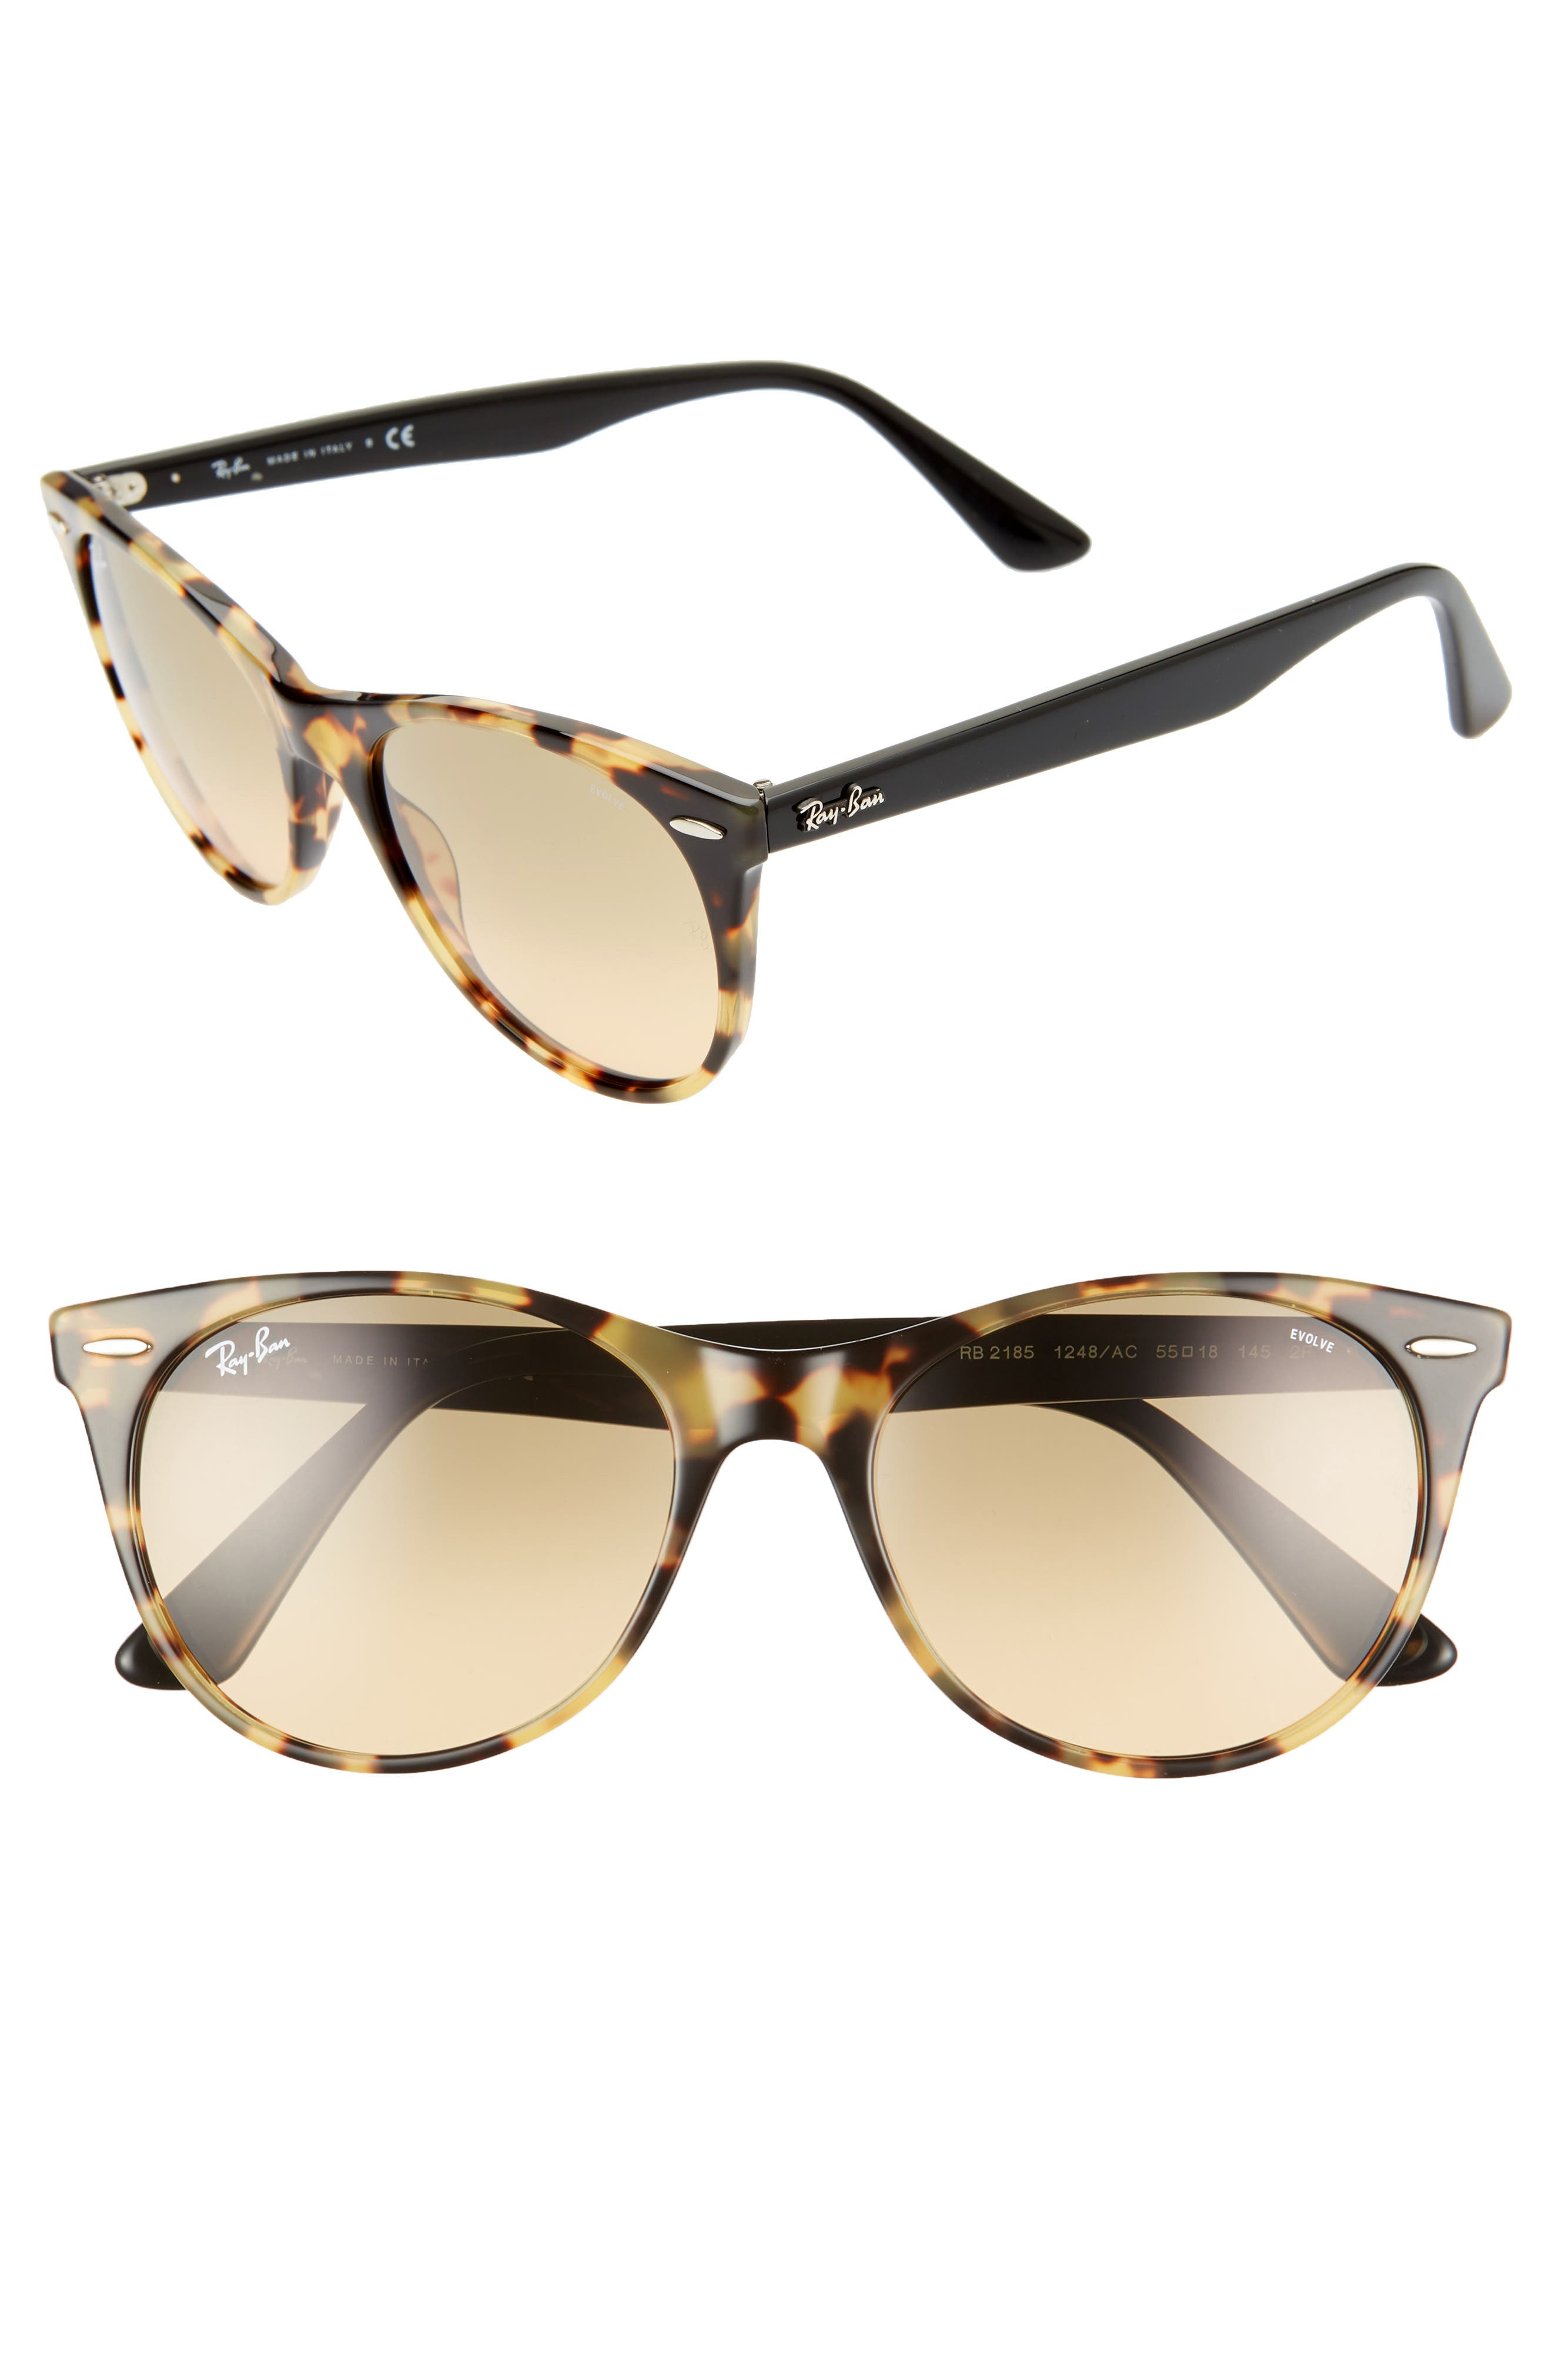 Ray-Ban Wayfarer Ii 55Mm Polarized Photochromic Sunglasses - Yellow Tortoise Solid